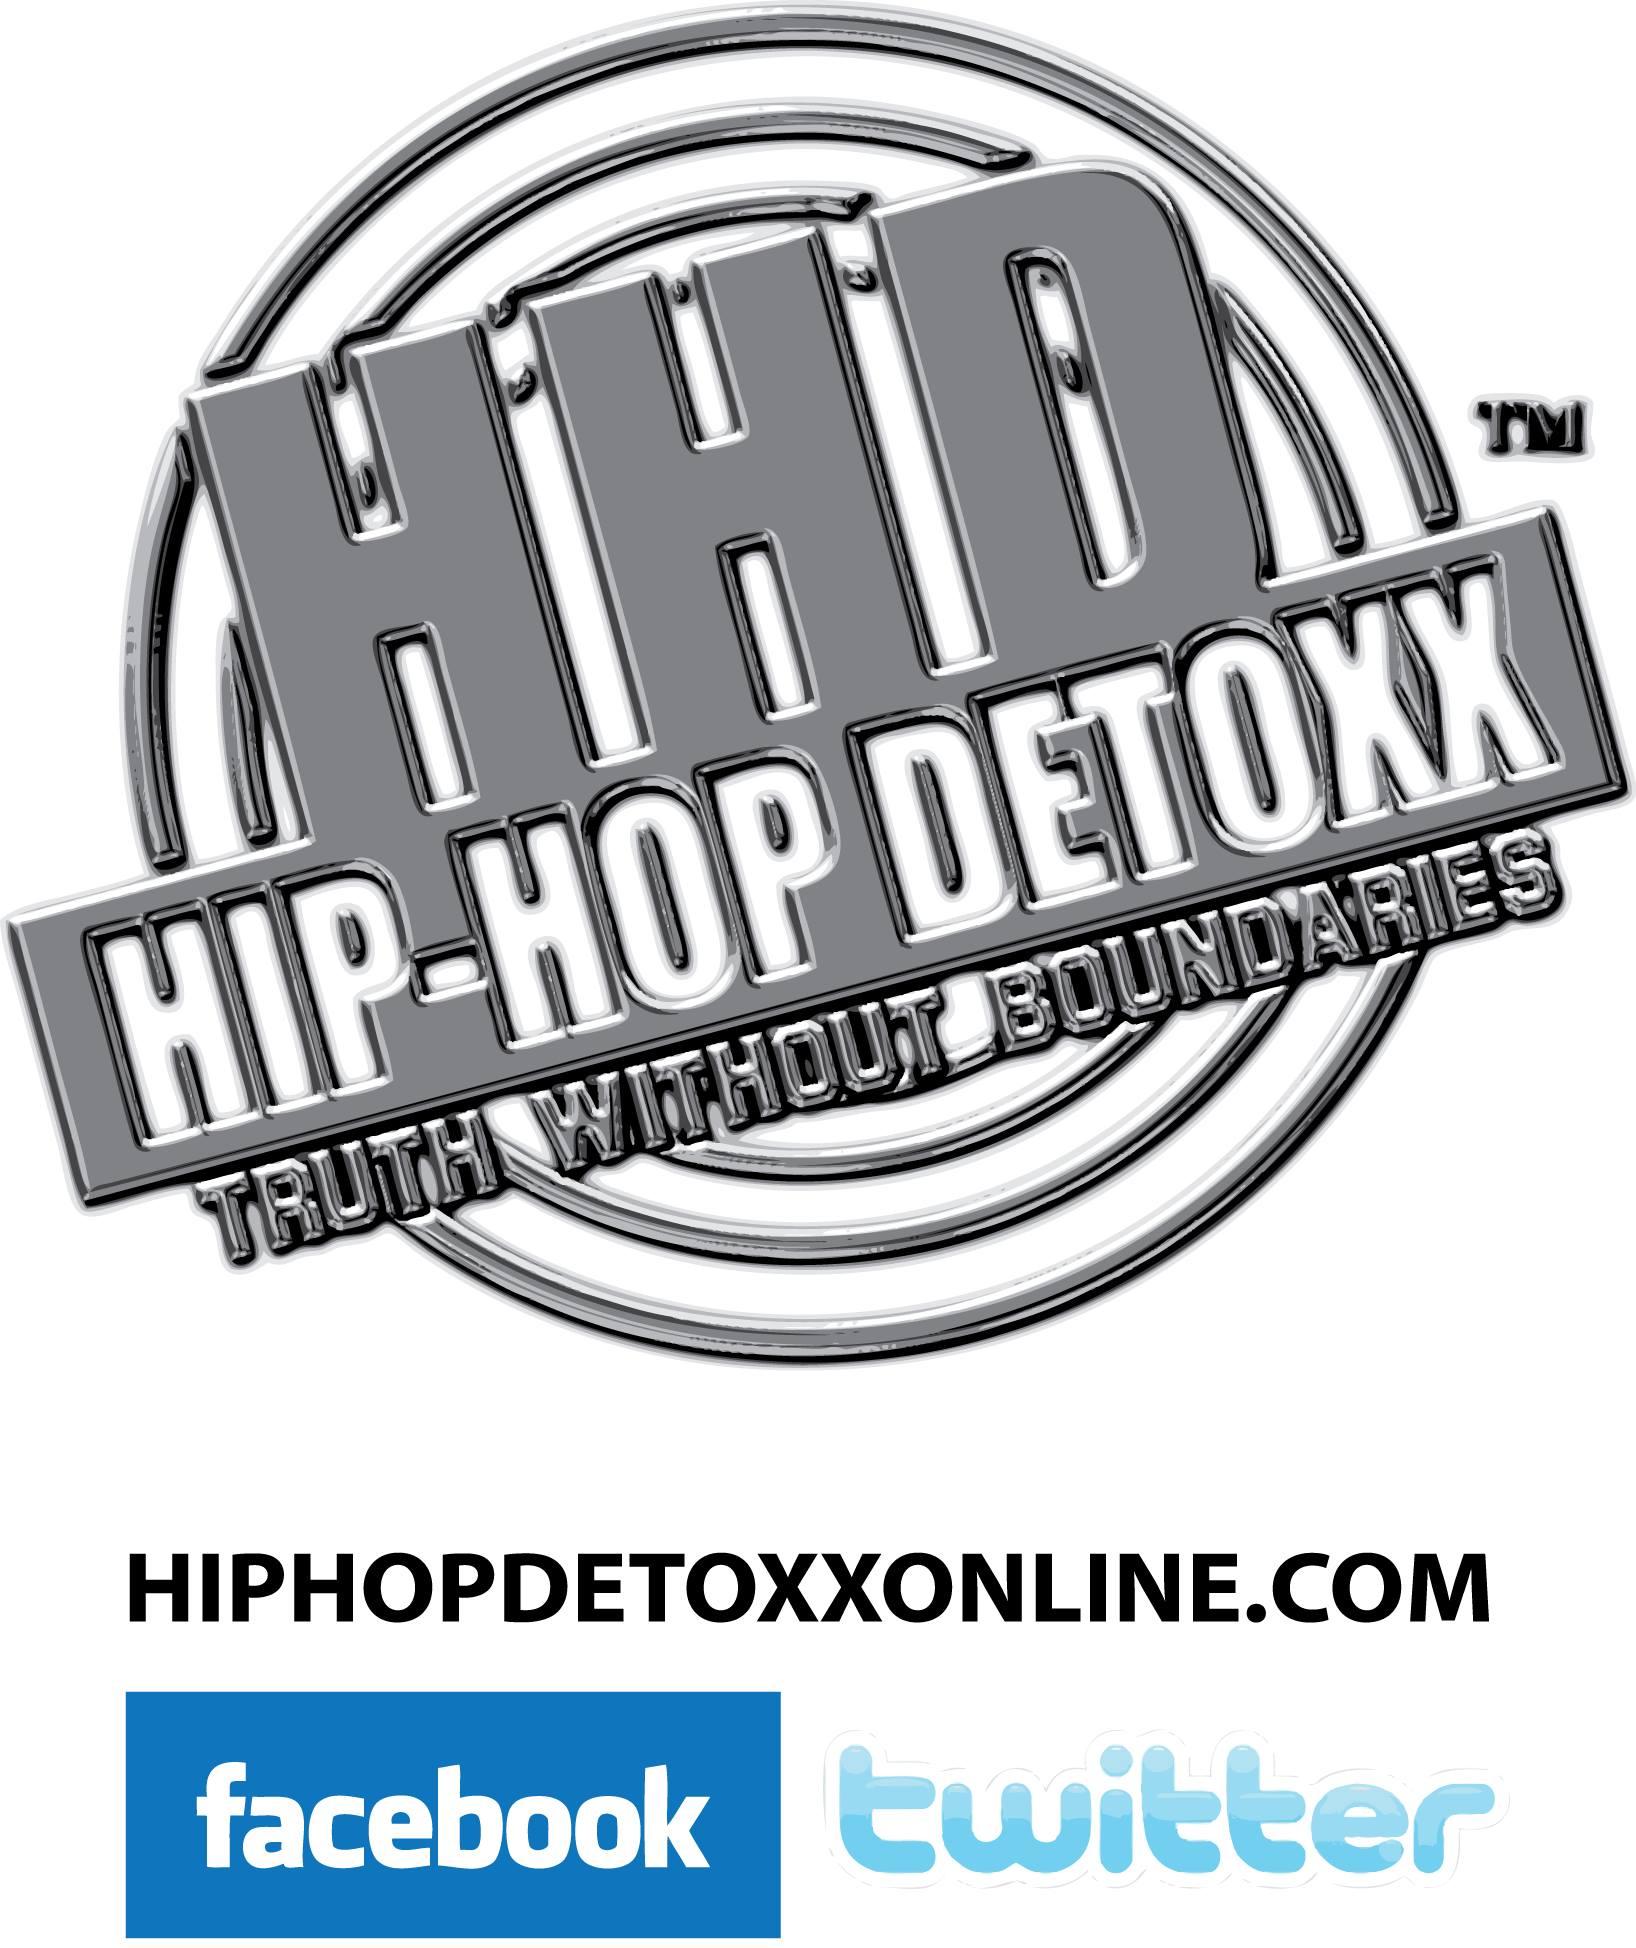 HHDetox.jpg